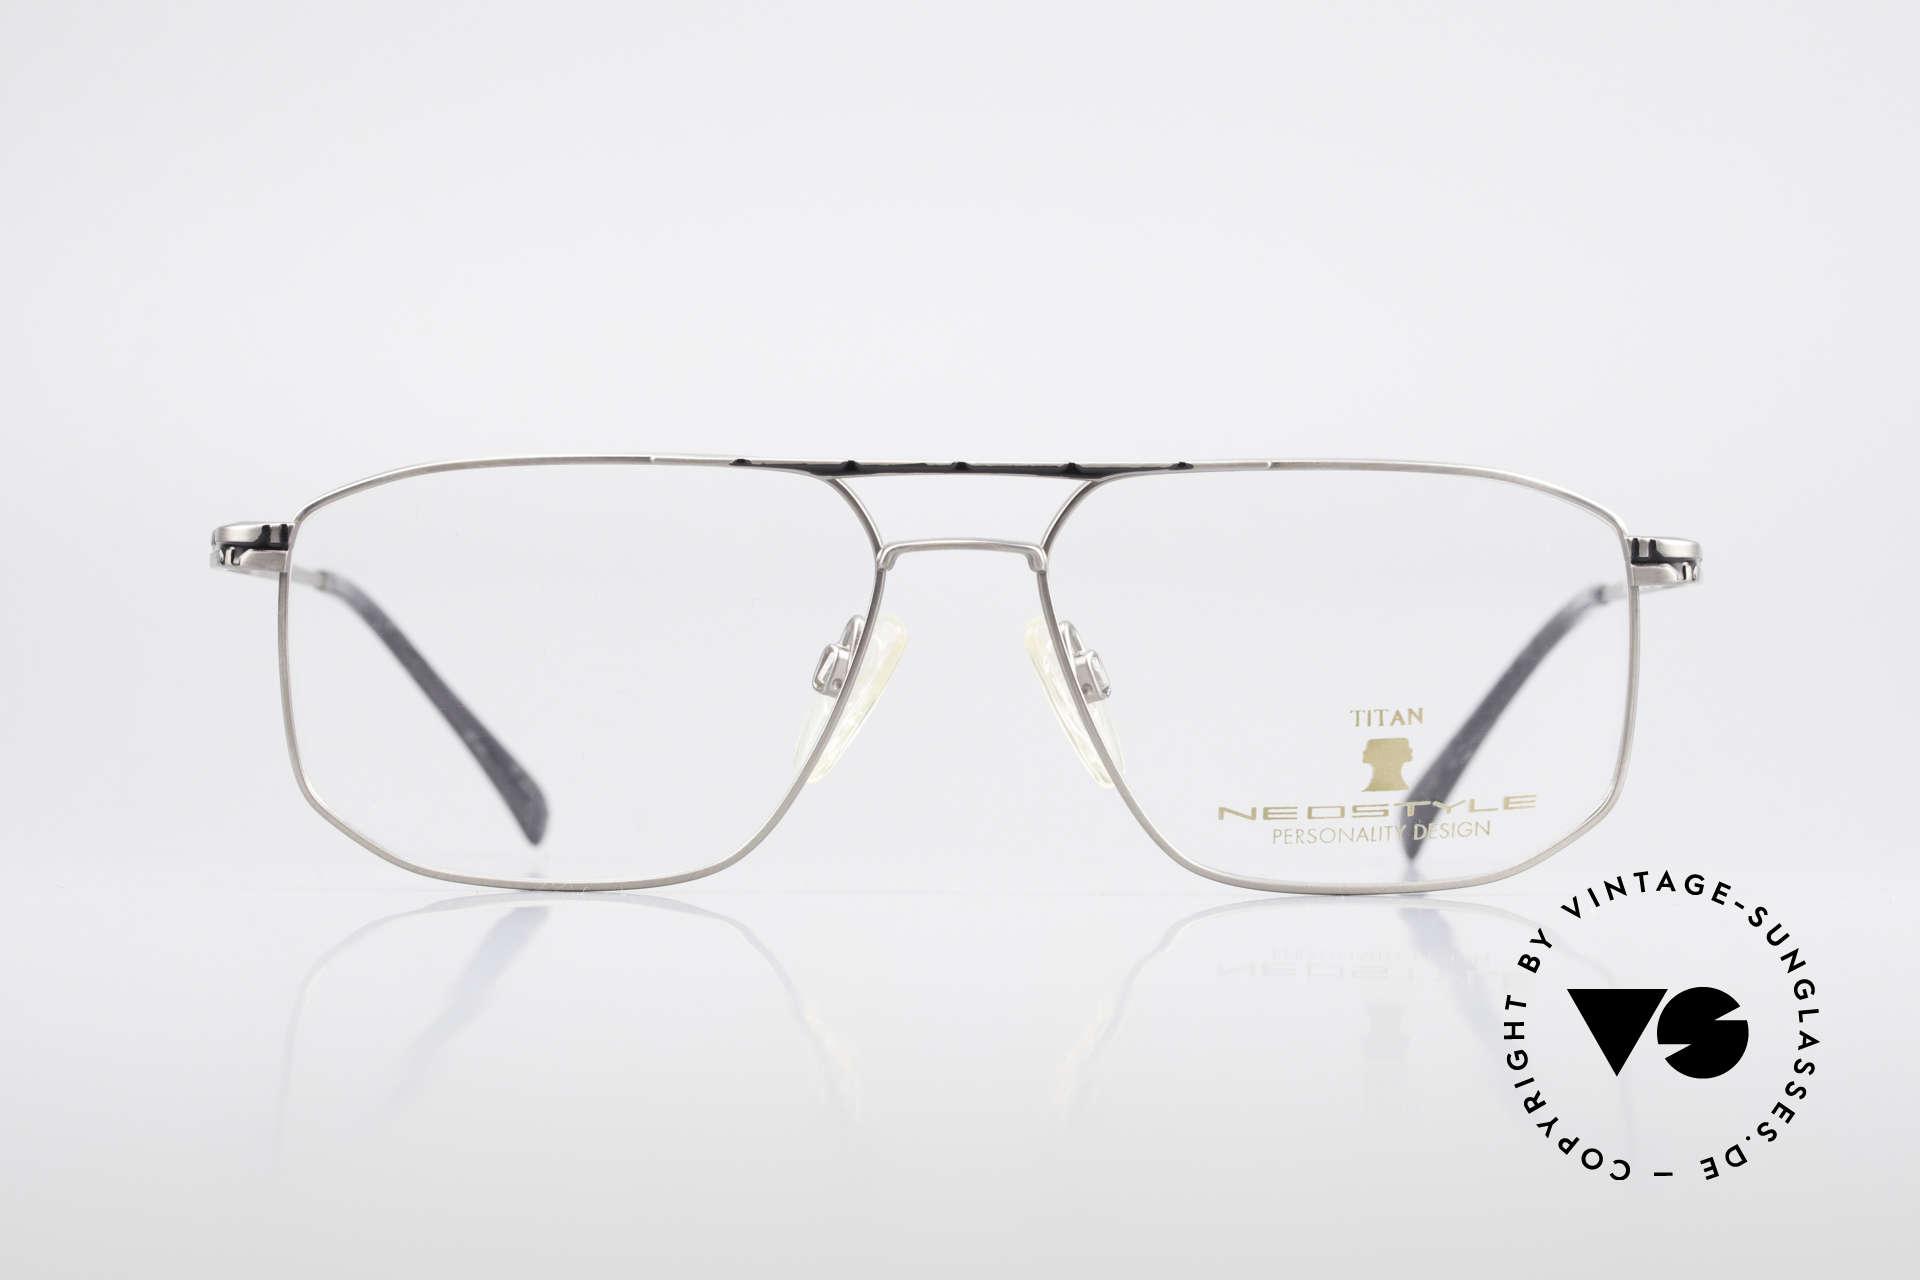 Neostyle Dynasty 362 XL Titanium Eyeglasses Men, top-notch craftsmanship (pure Titanium frame), Made for Men